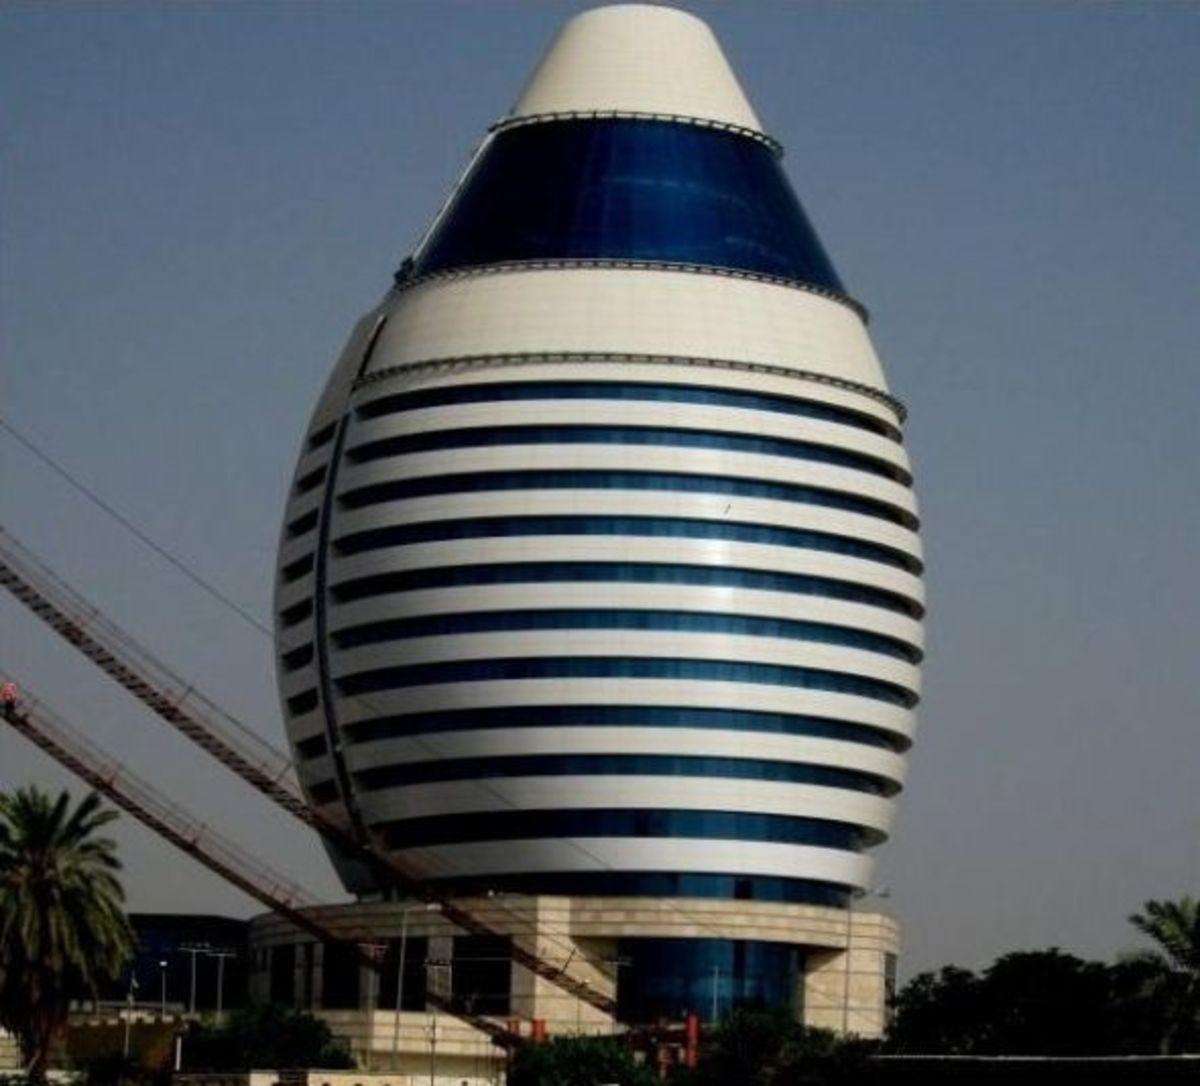 Hotel in Khartoum, Sudan